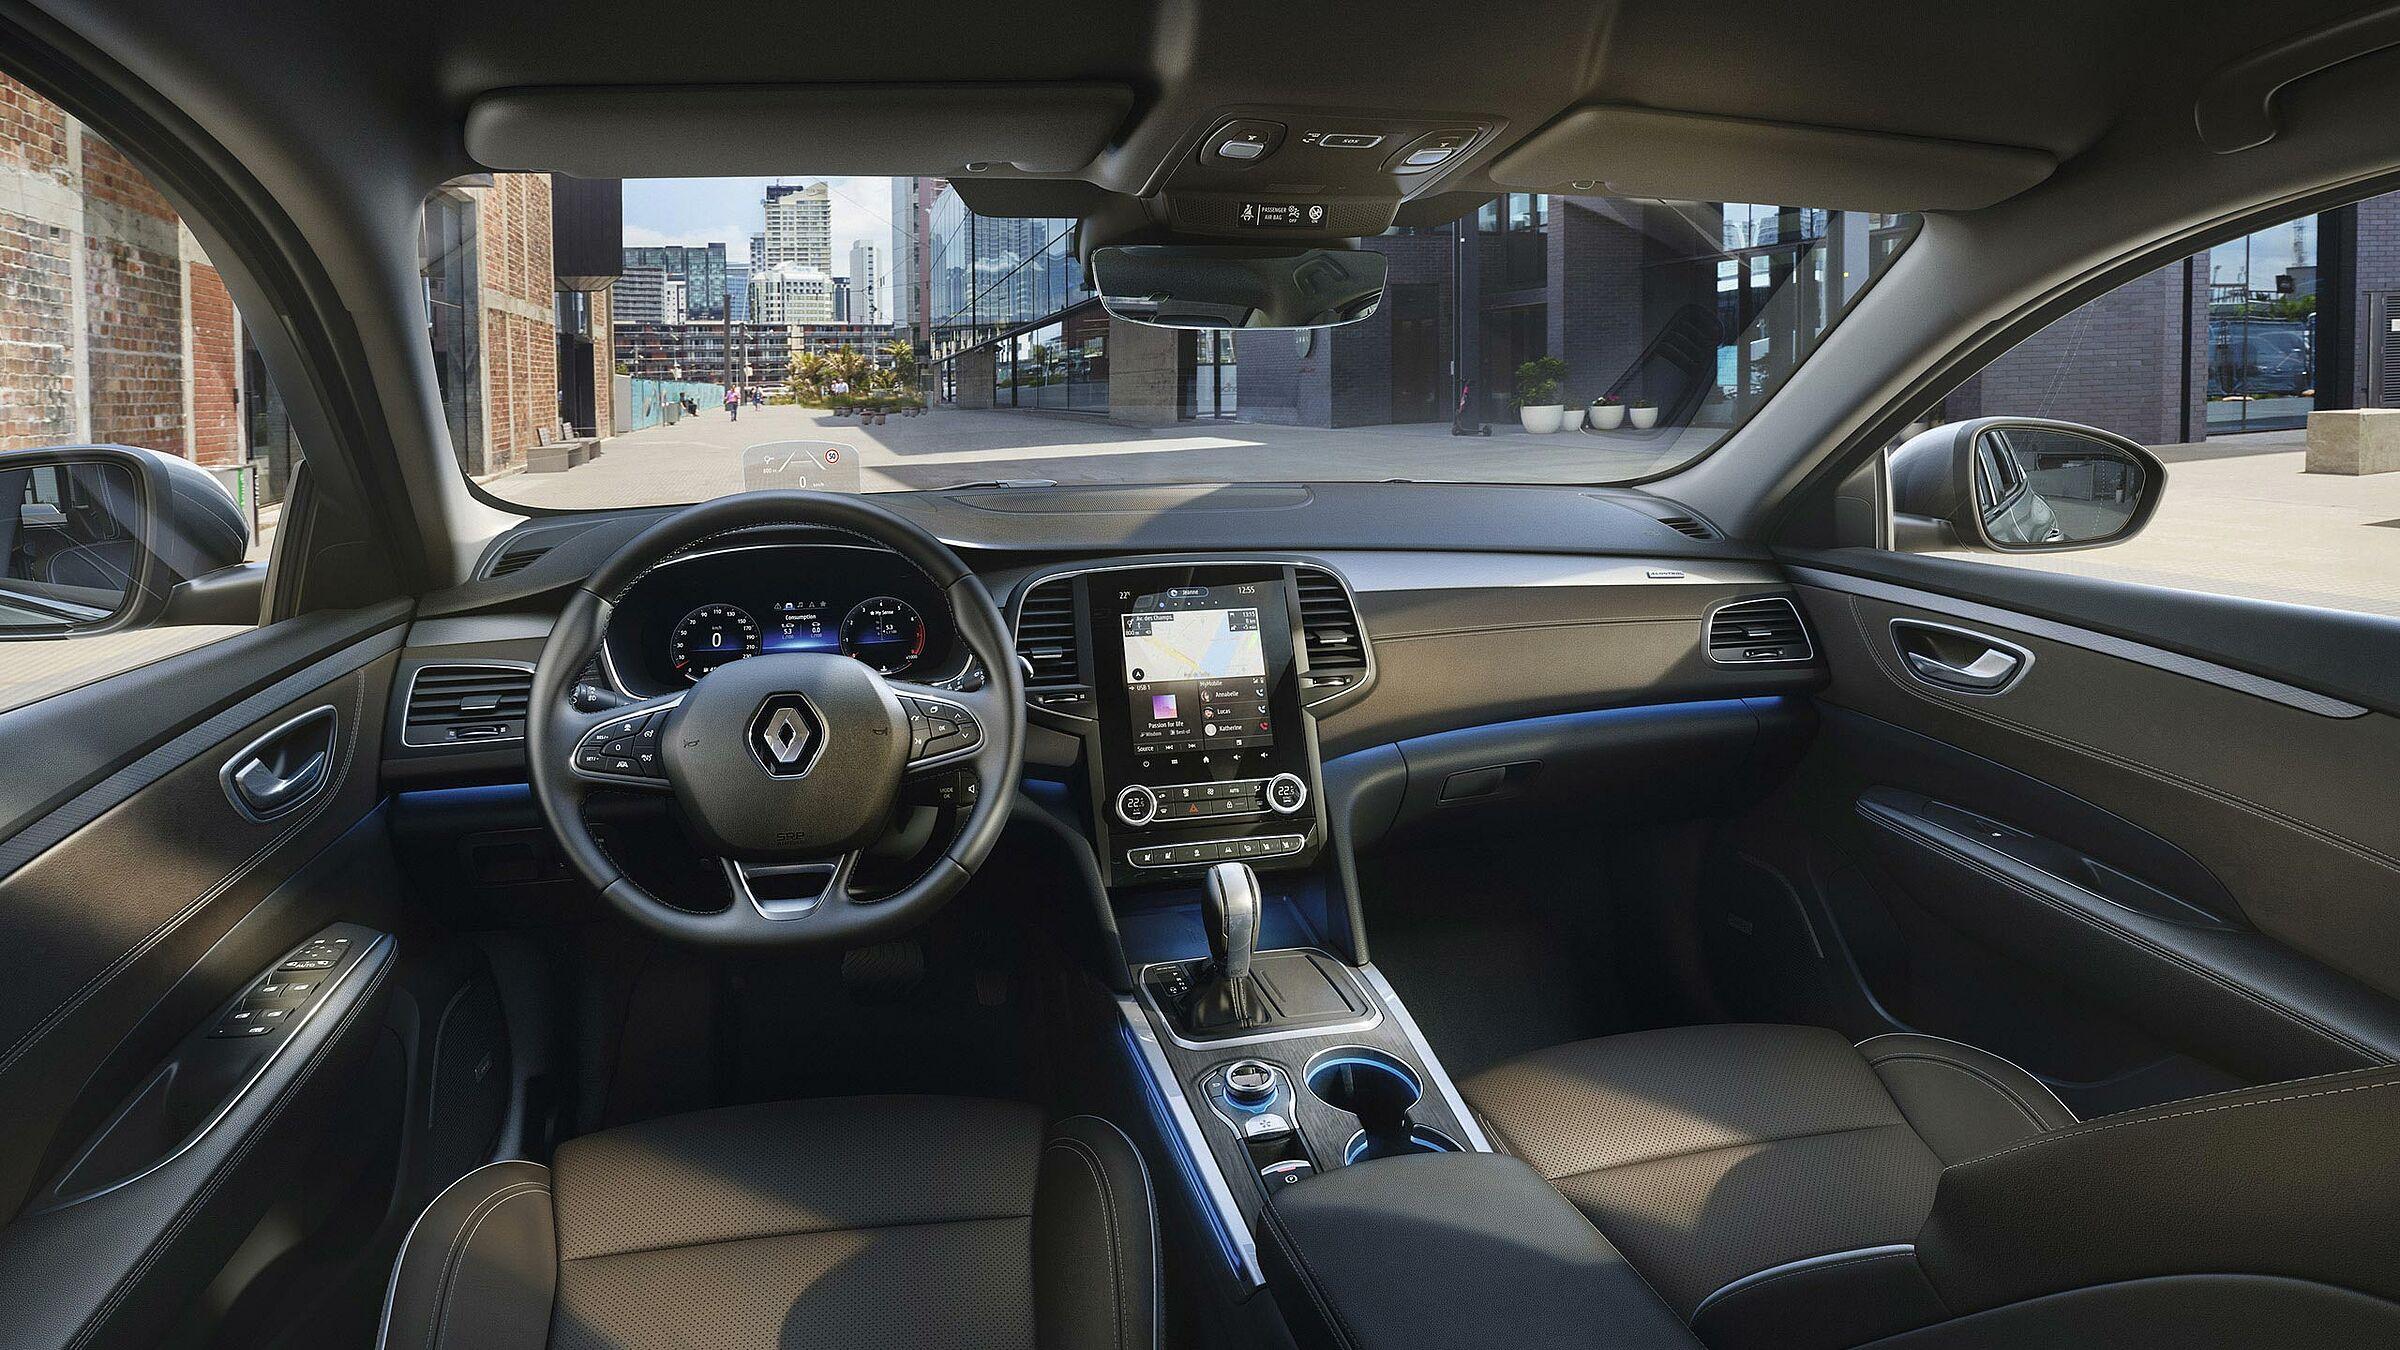 Renault Talisman Autozentren P&A - Preckel